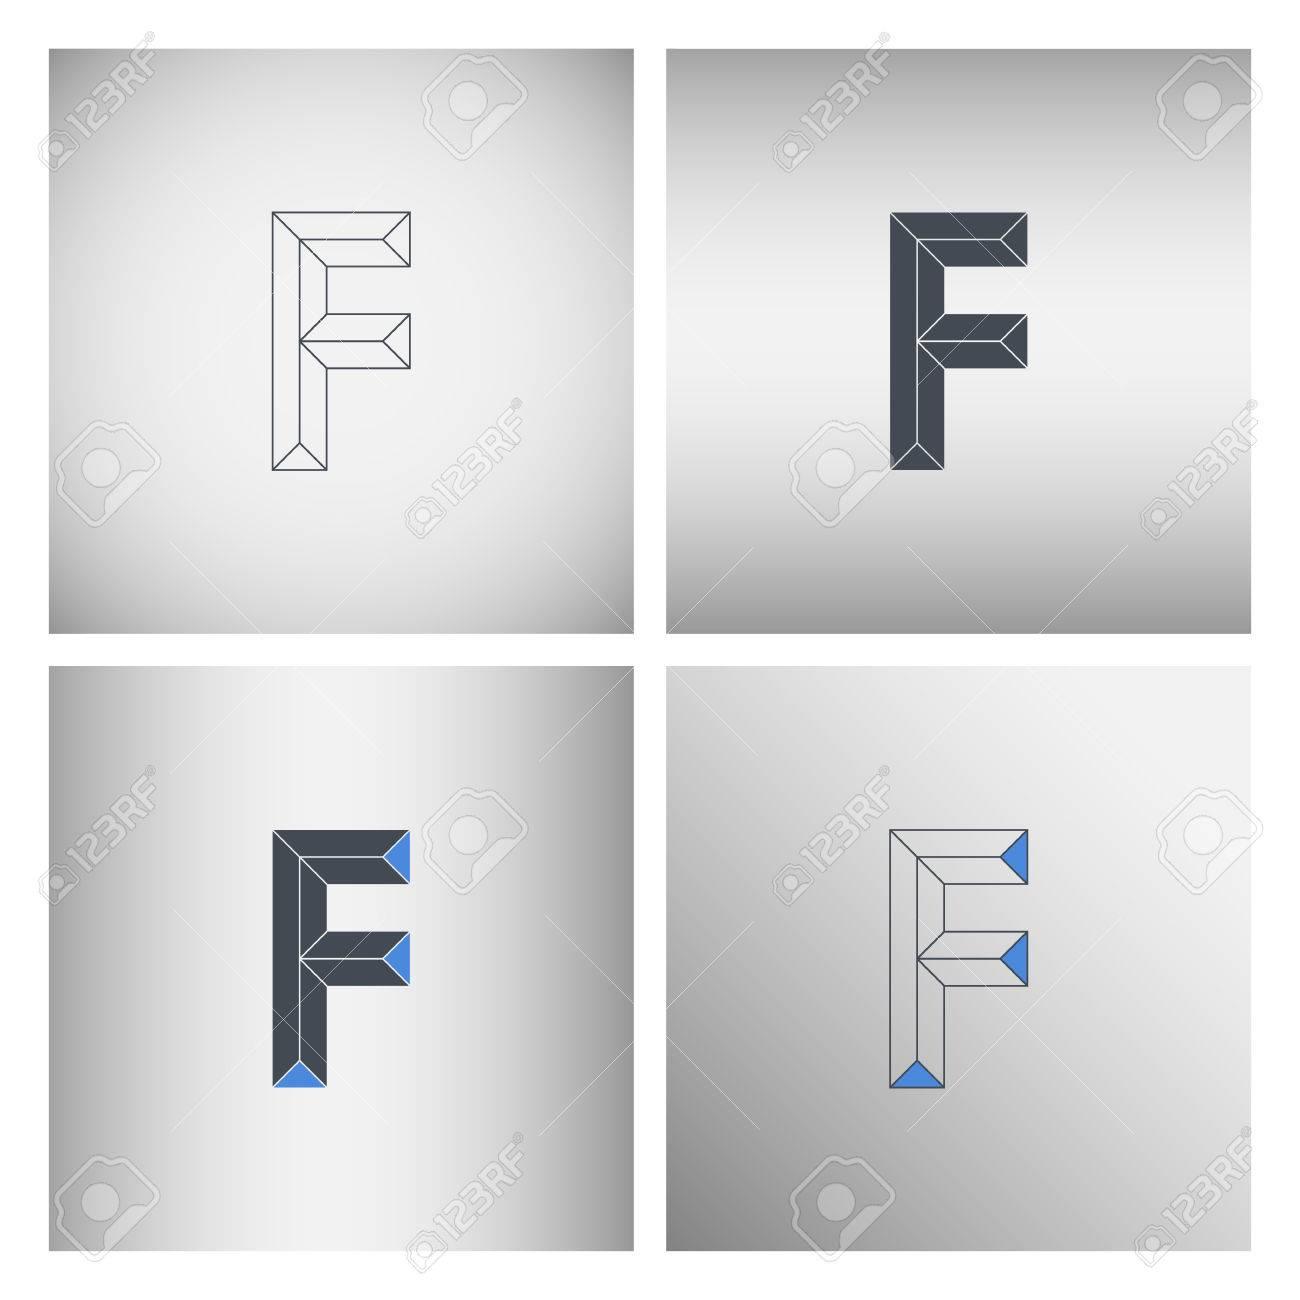 Set of letter f logo icons logo design template vector set of letter f logo icons logo design template vector illustration stock vector maxwellsz